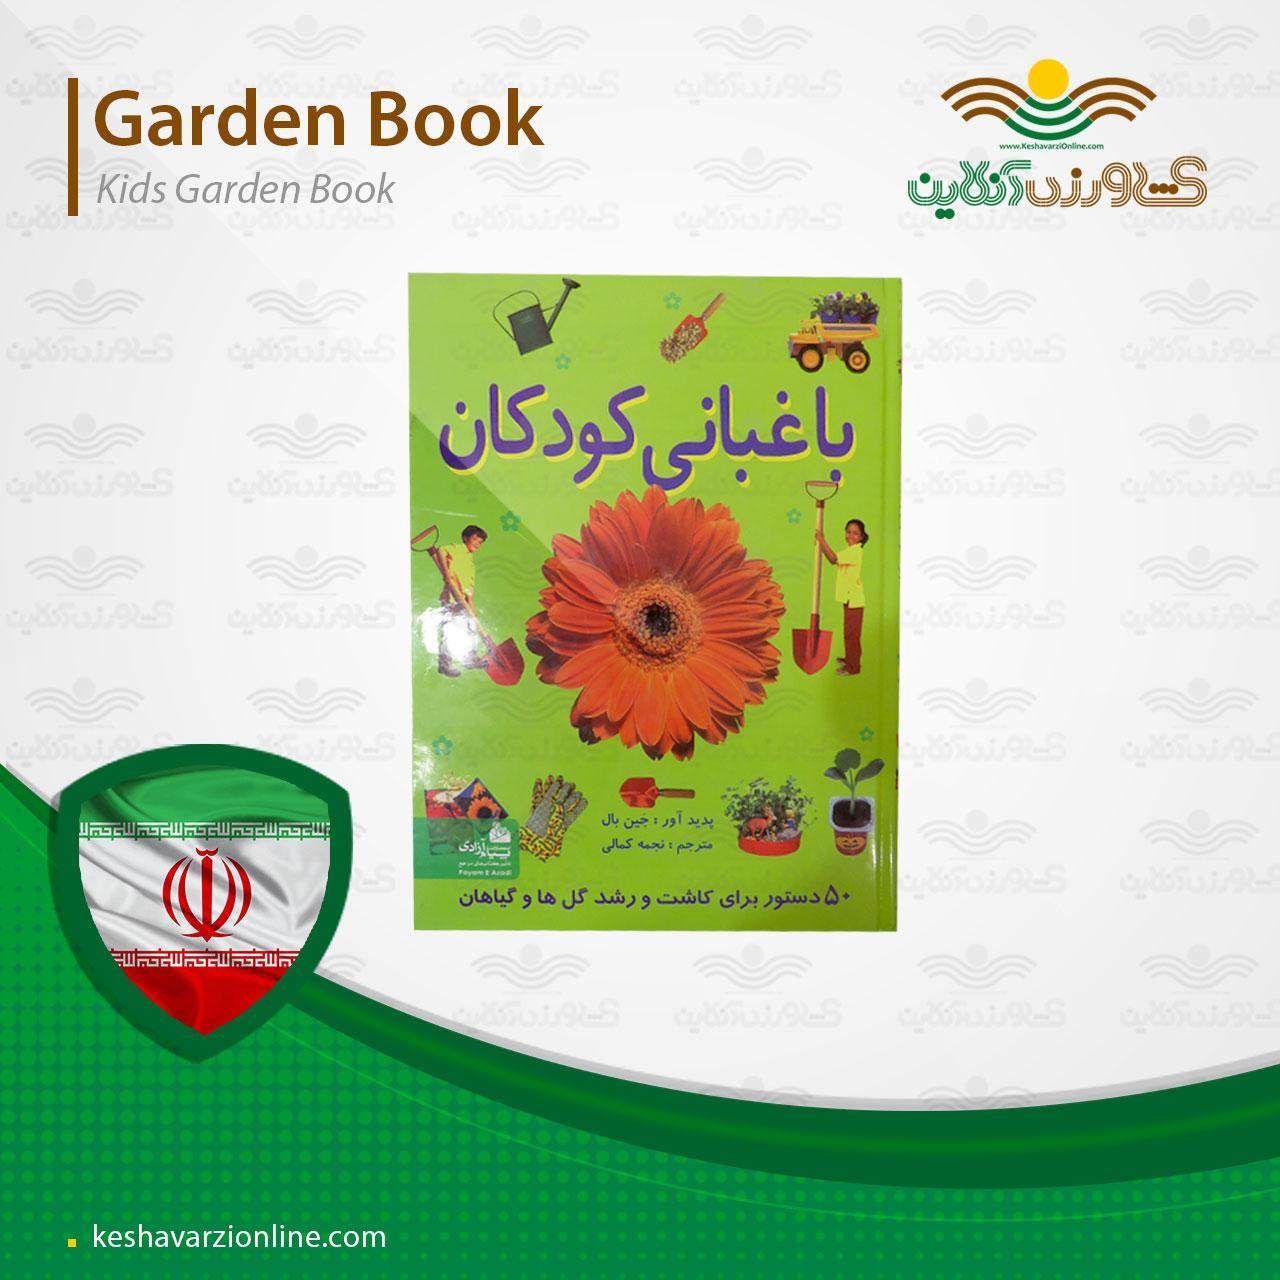 کتاب باغبانی کودکان